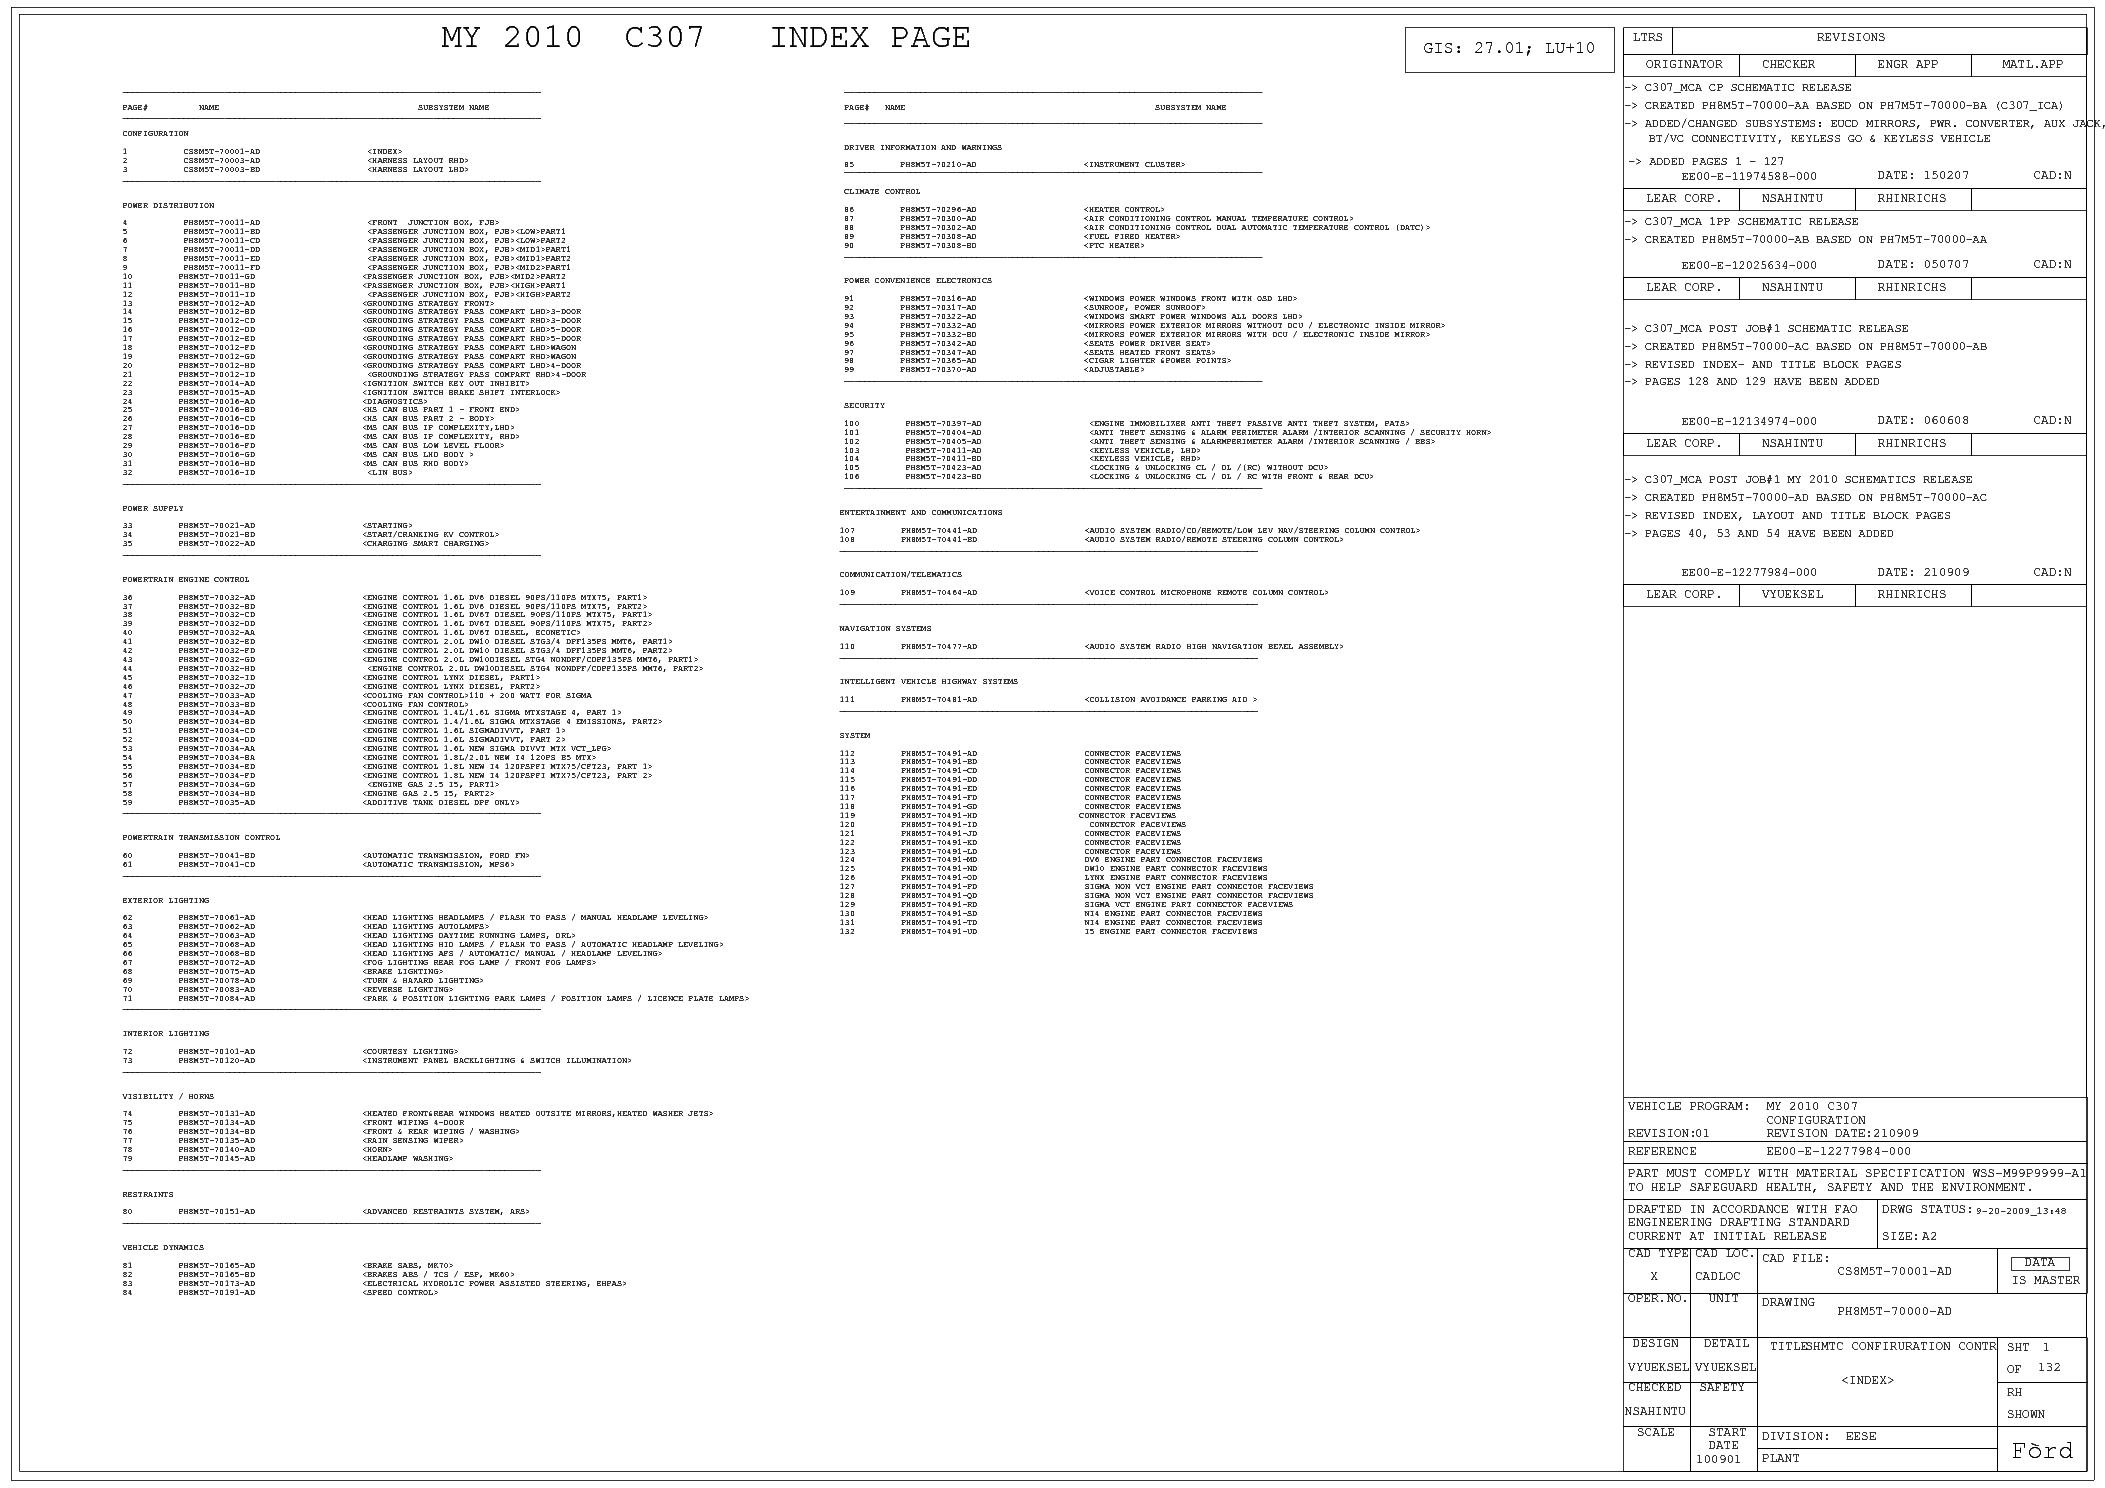 FORD FOCUS MK2 2 5 PH8M5T FULL WIRING DIAGRAM Service Manual